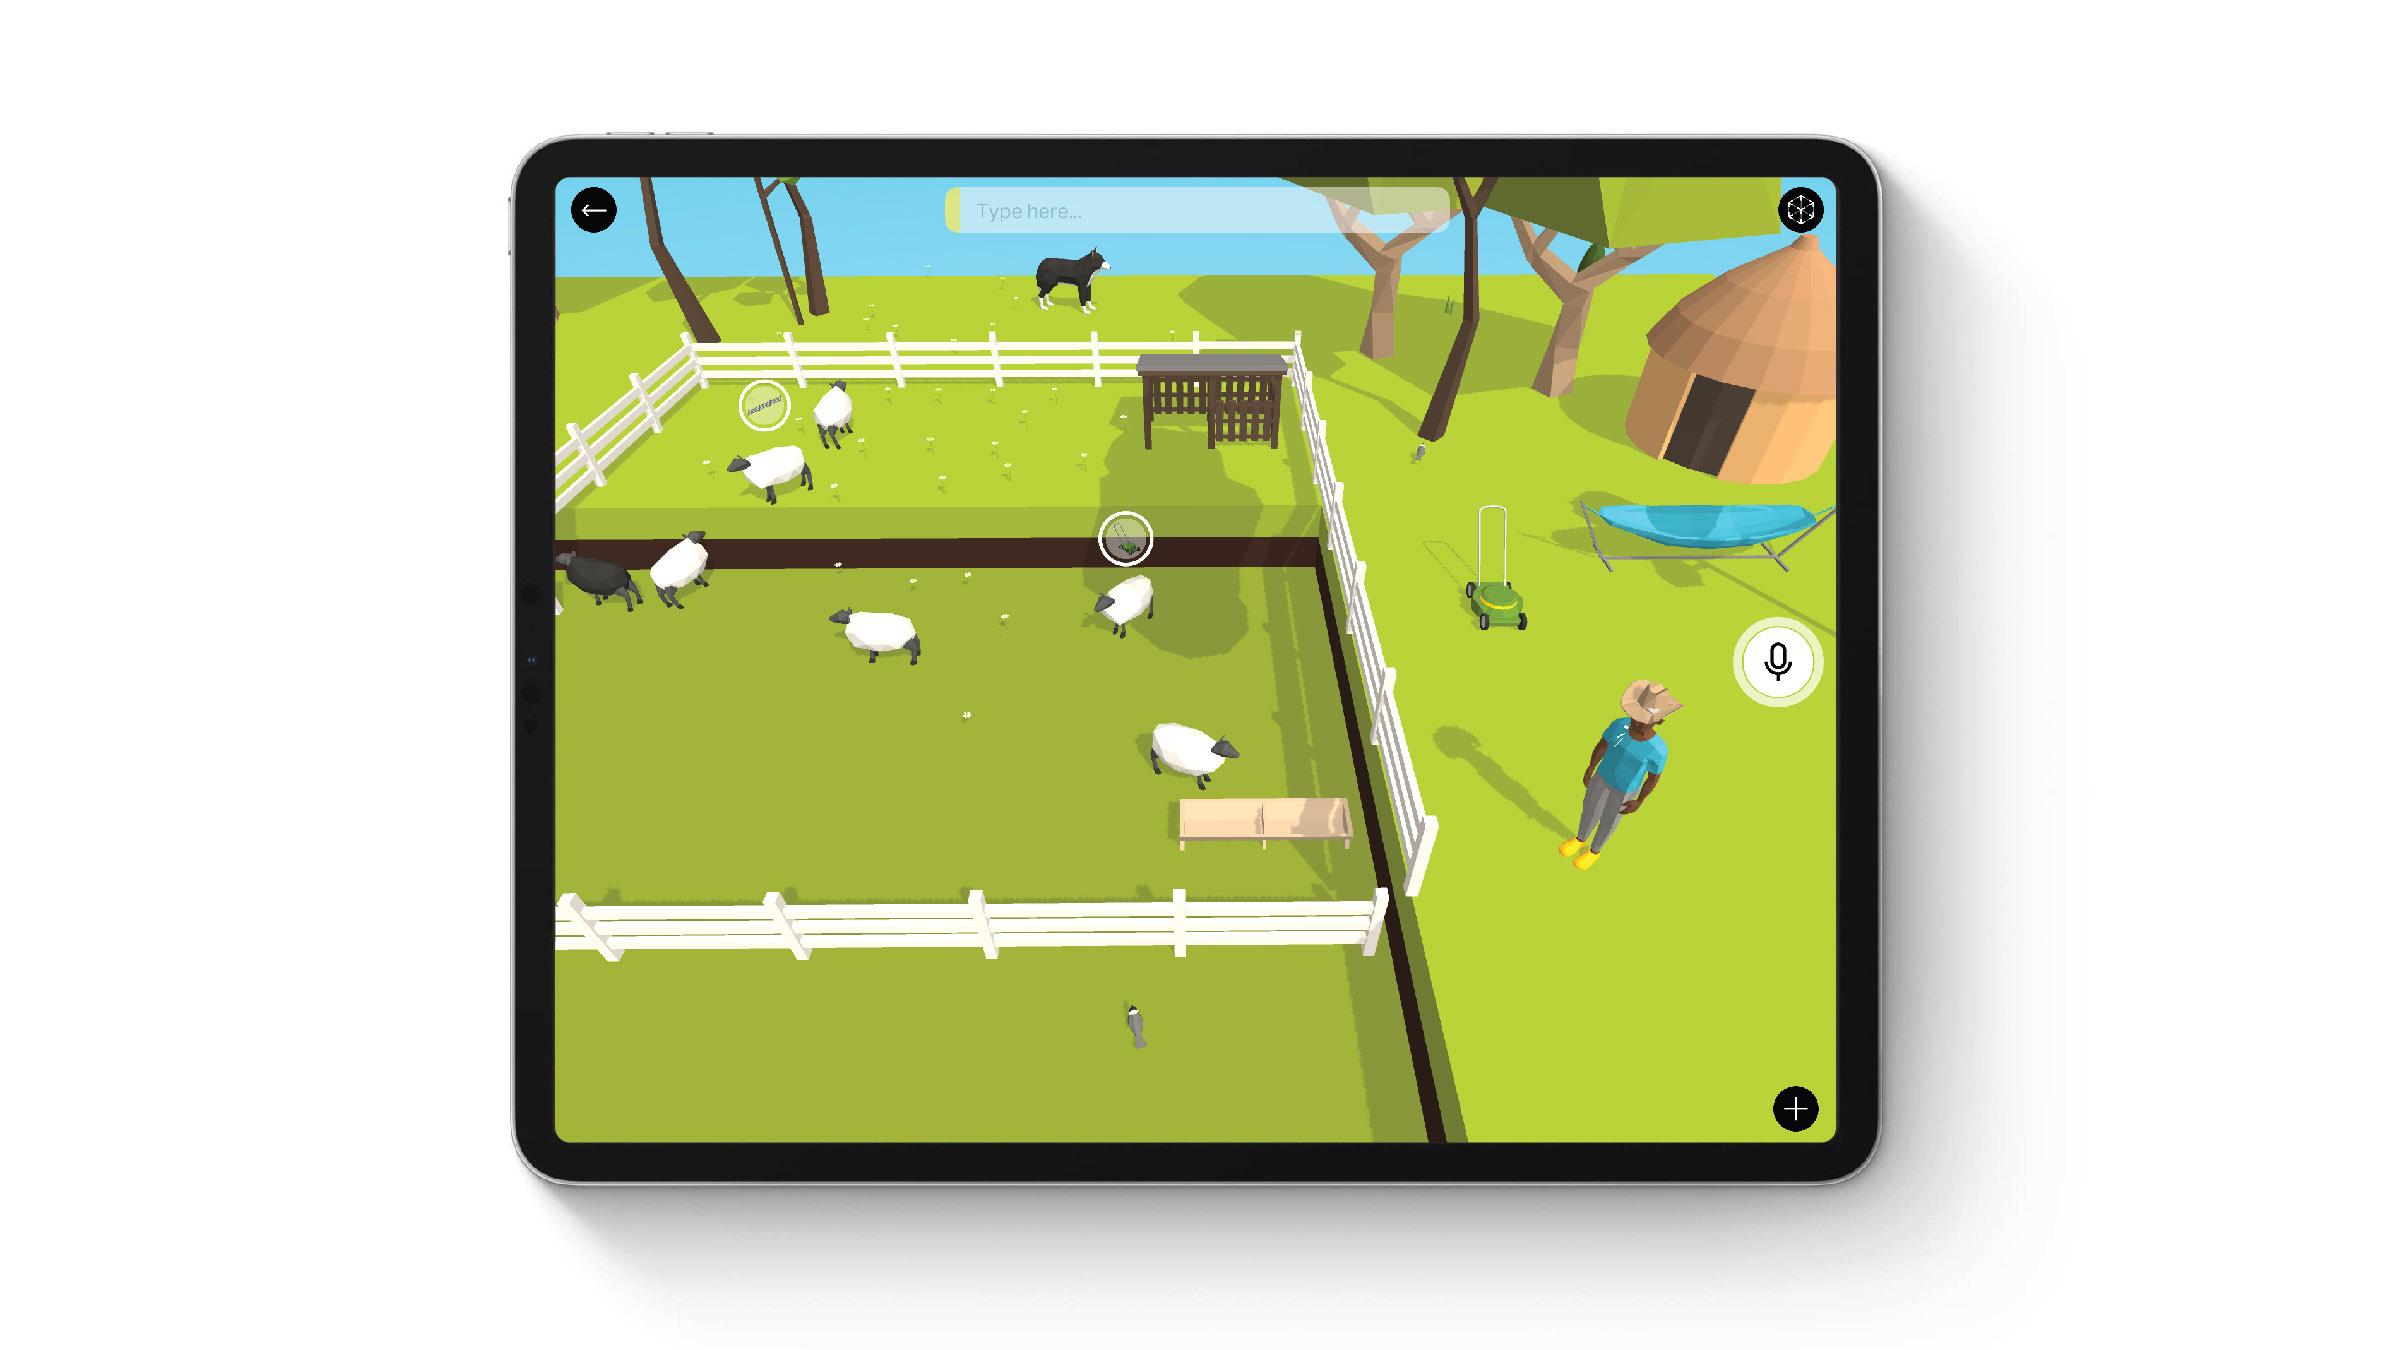 Moatboat-iPadUI-06.jpg